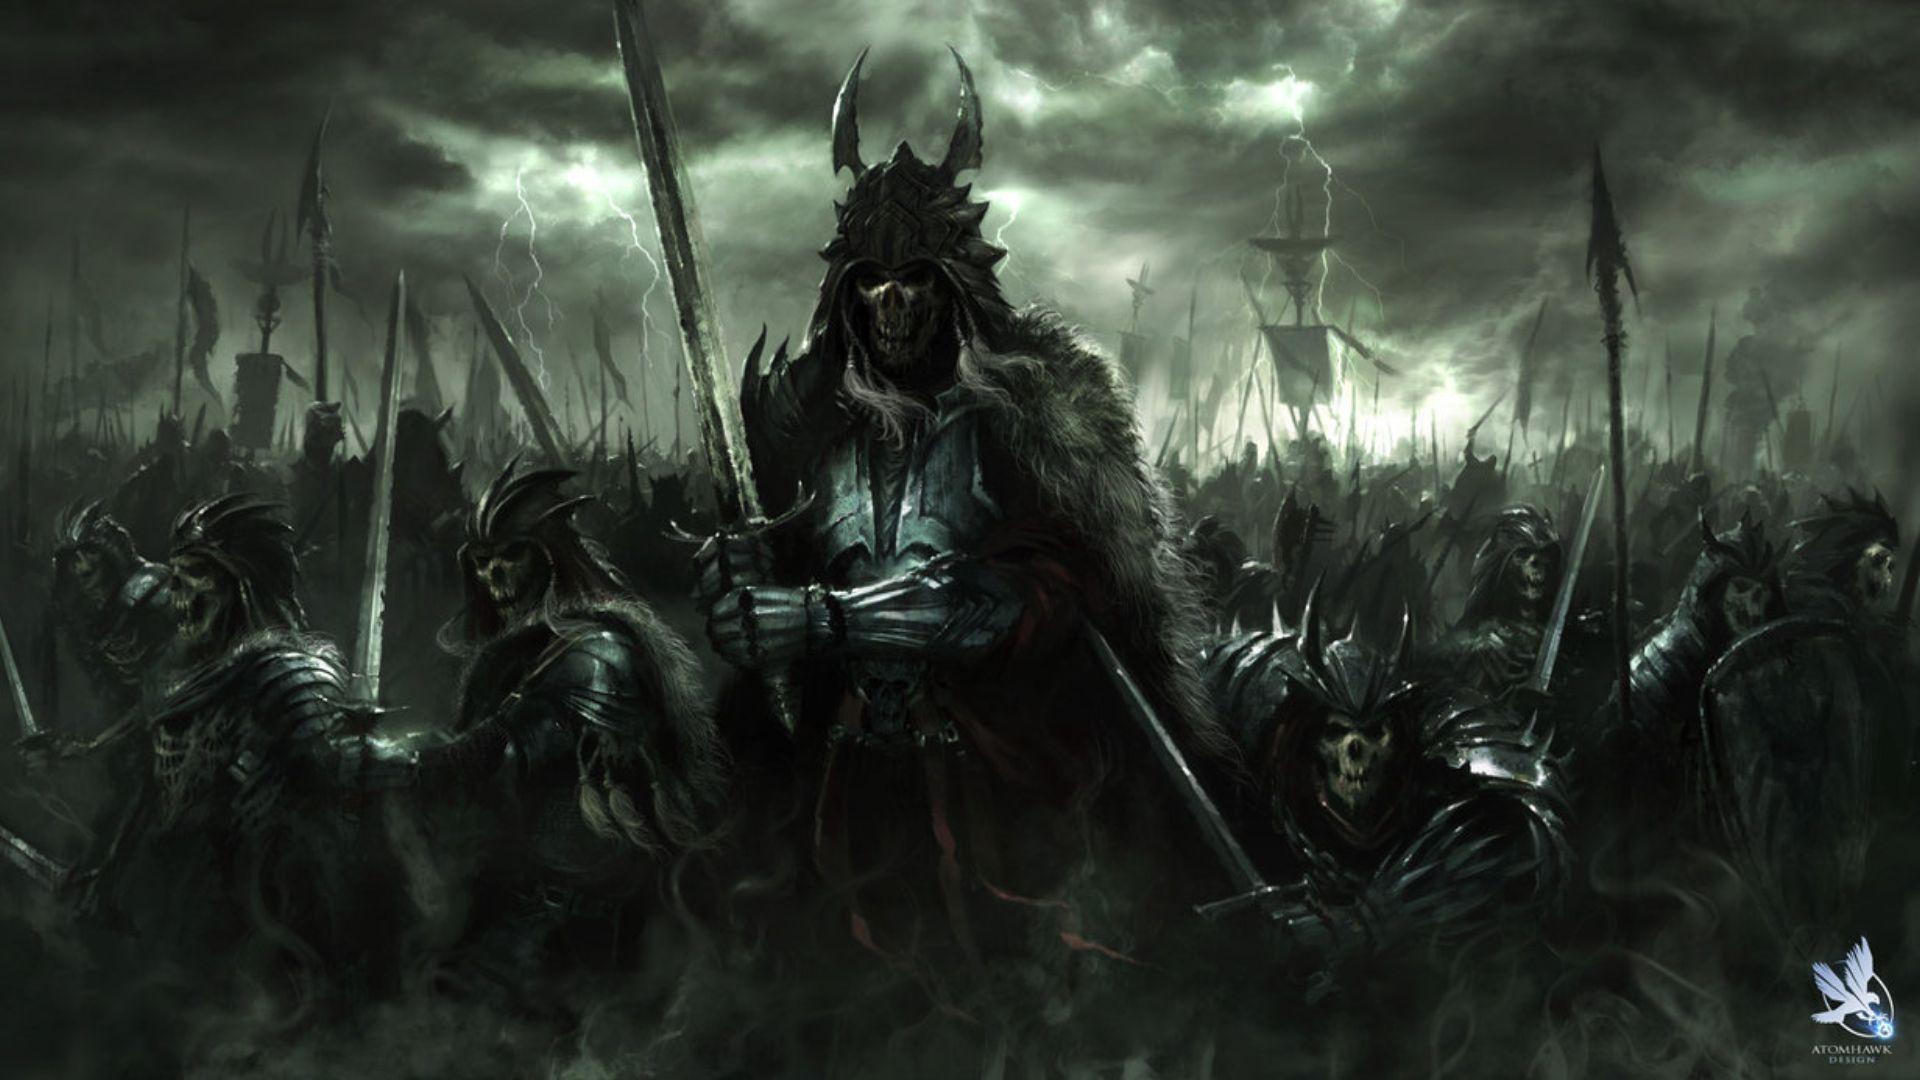 Fantasy Art Dark Horror Demon Skull Warrior Wepons Army